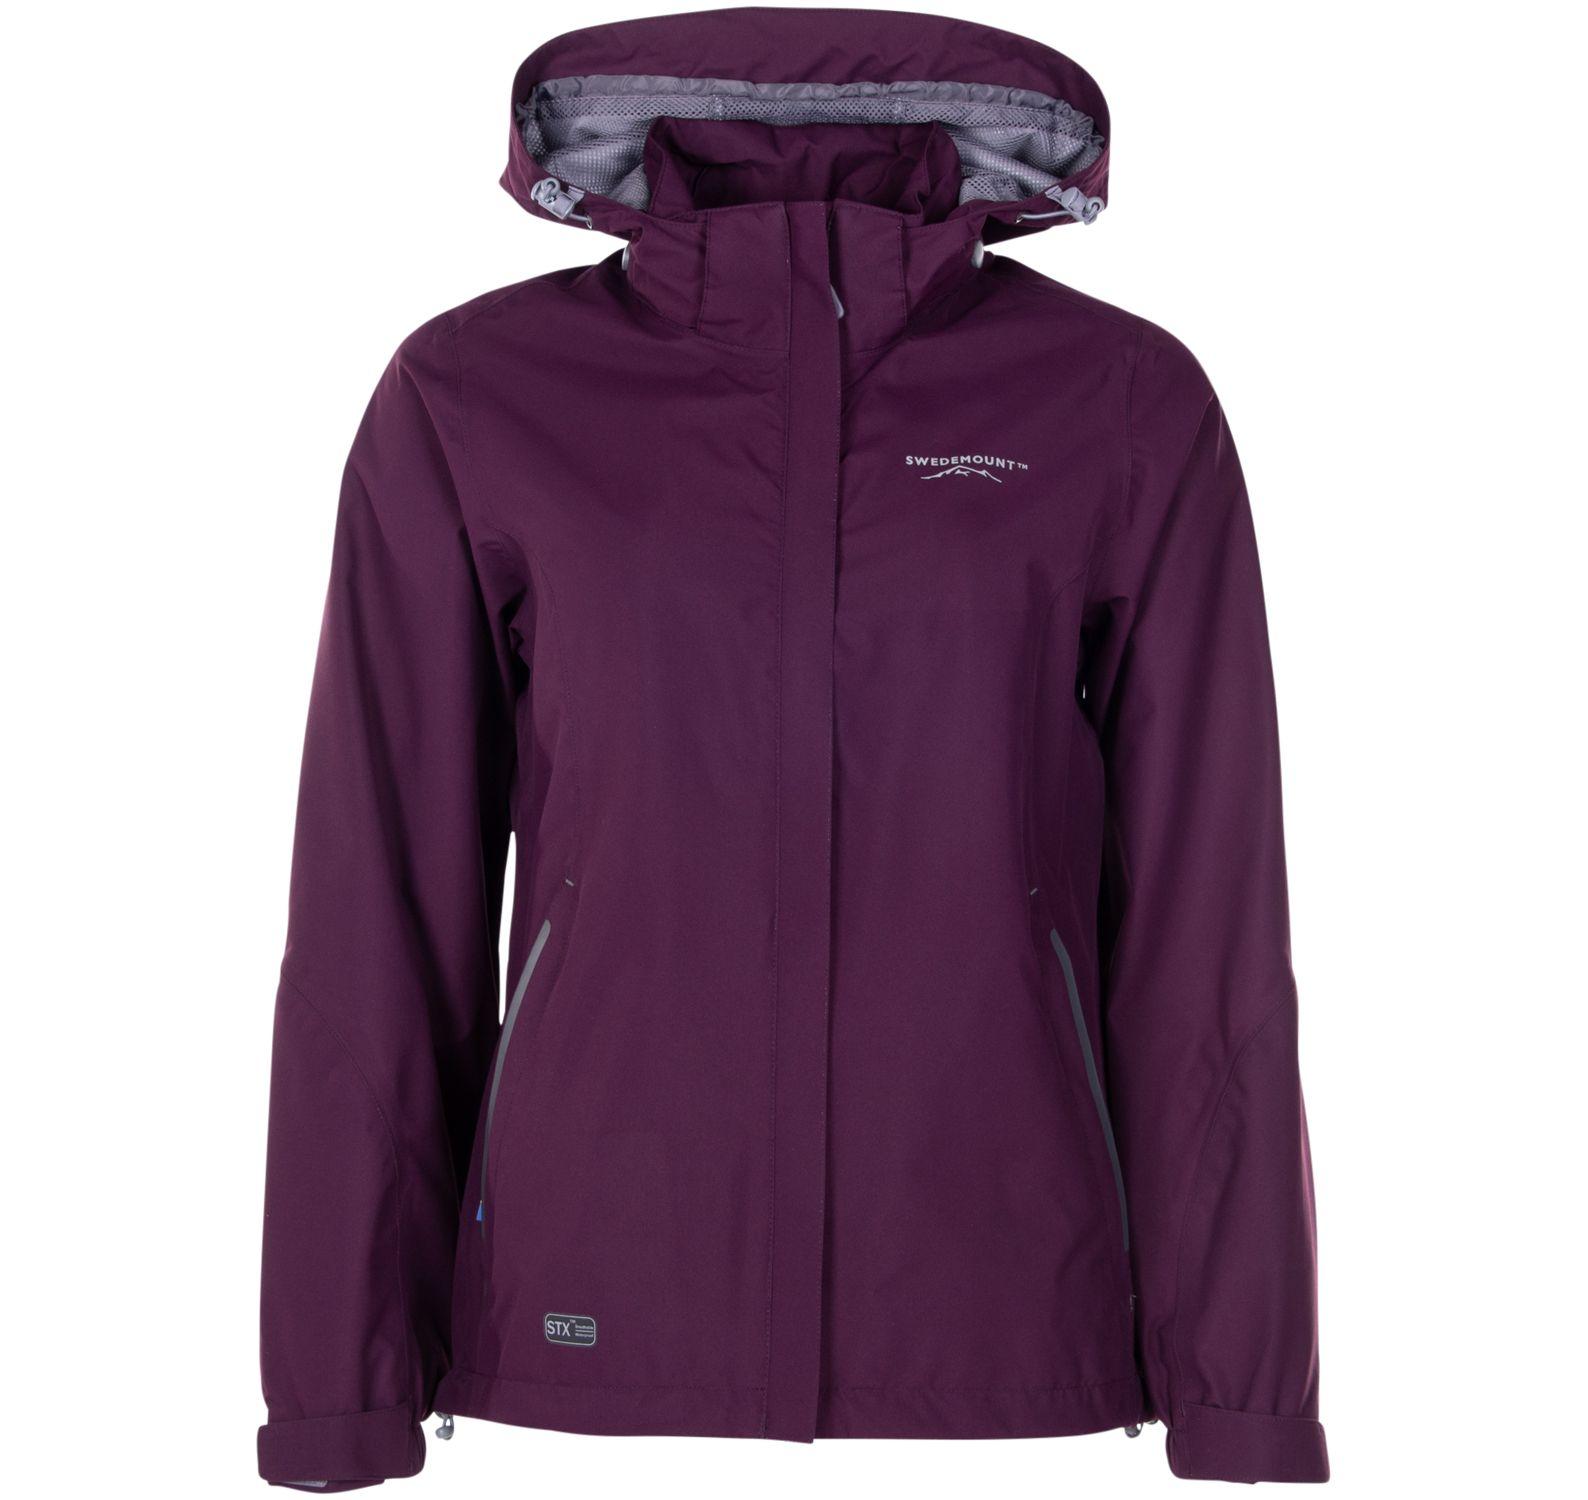 käringön jacket w, plum, 36, regnkläder